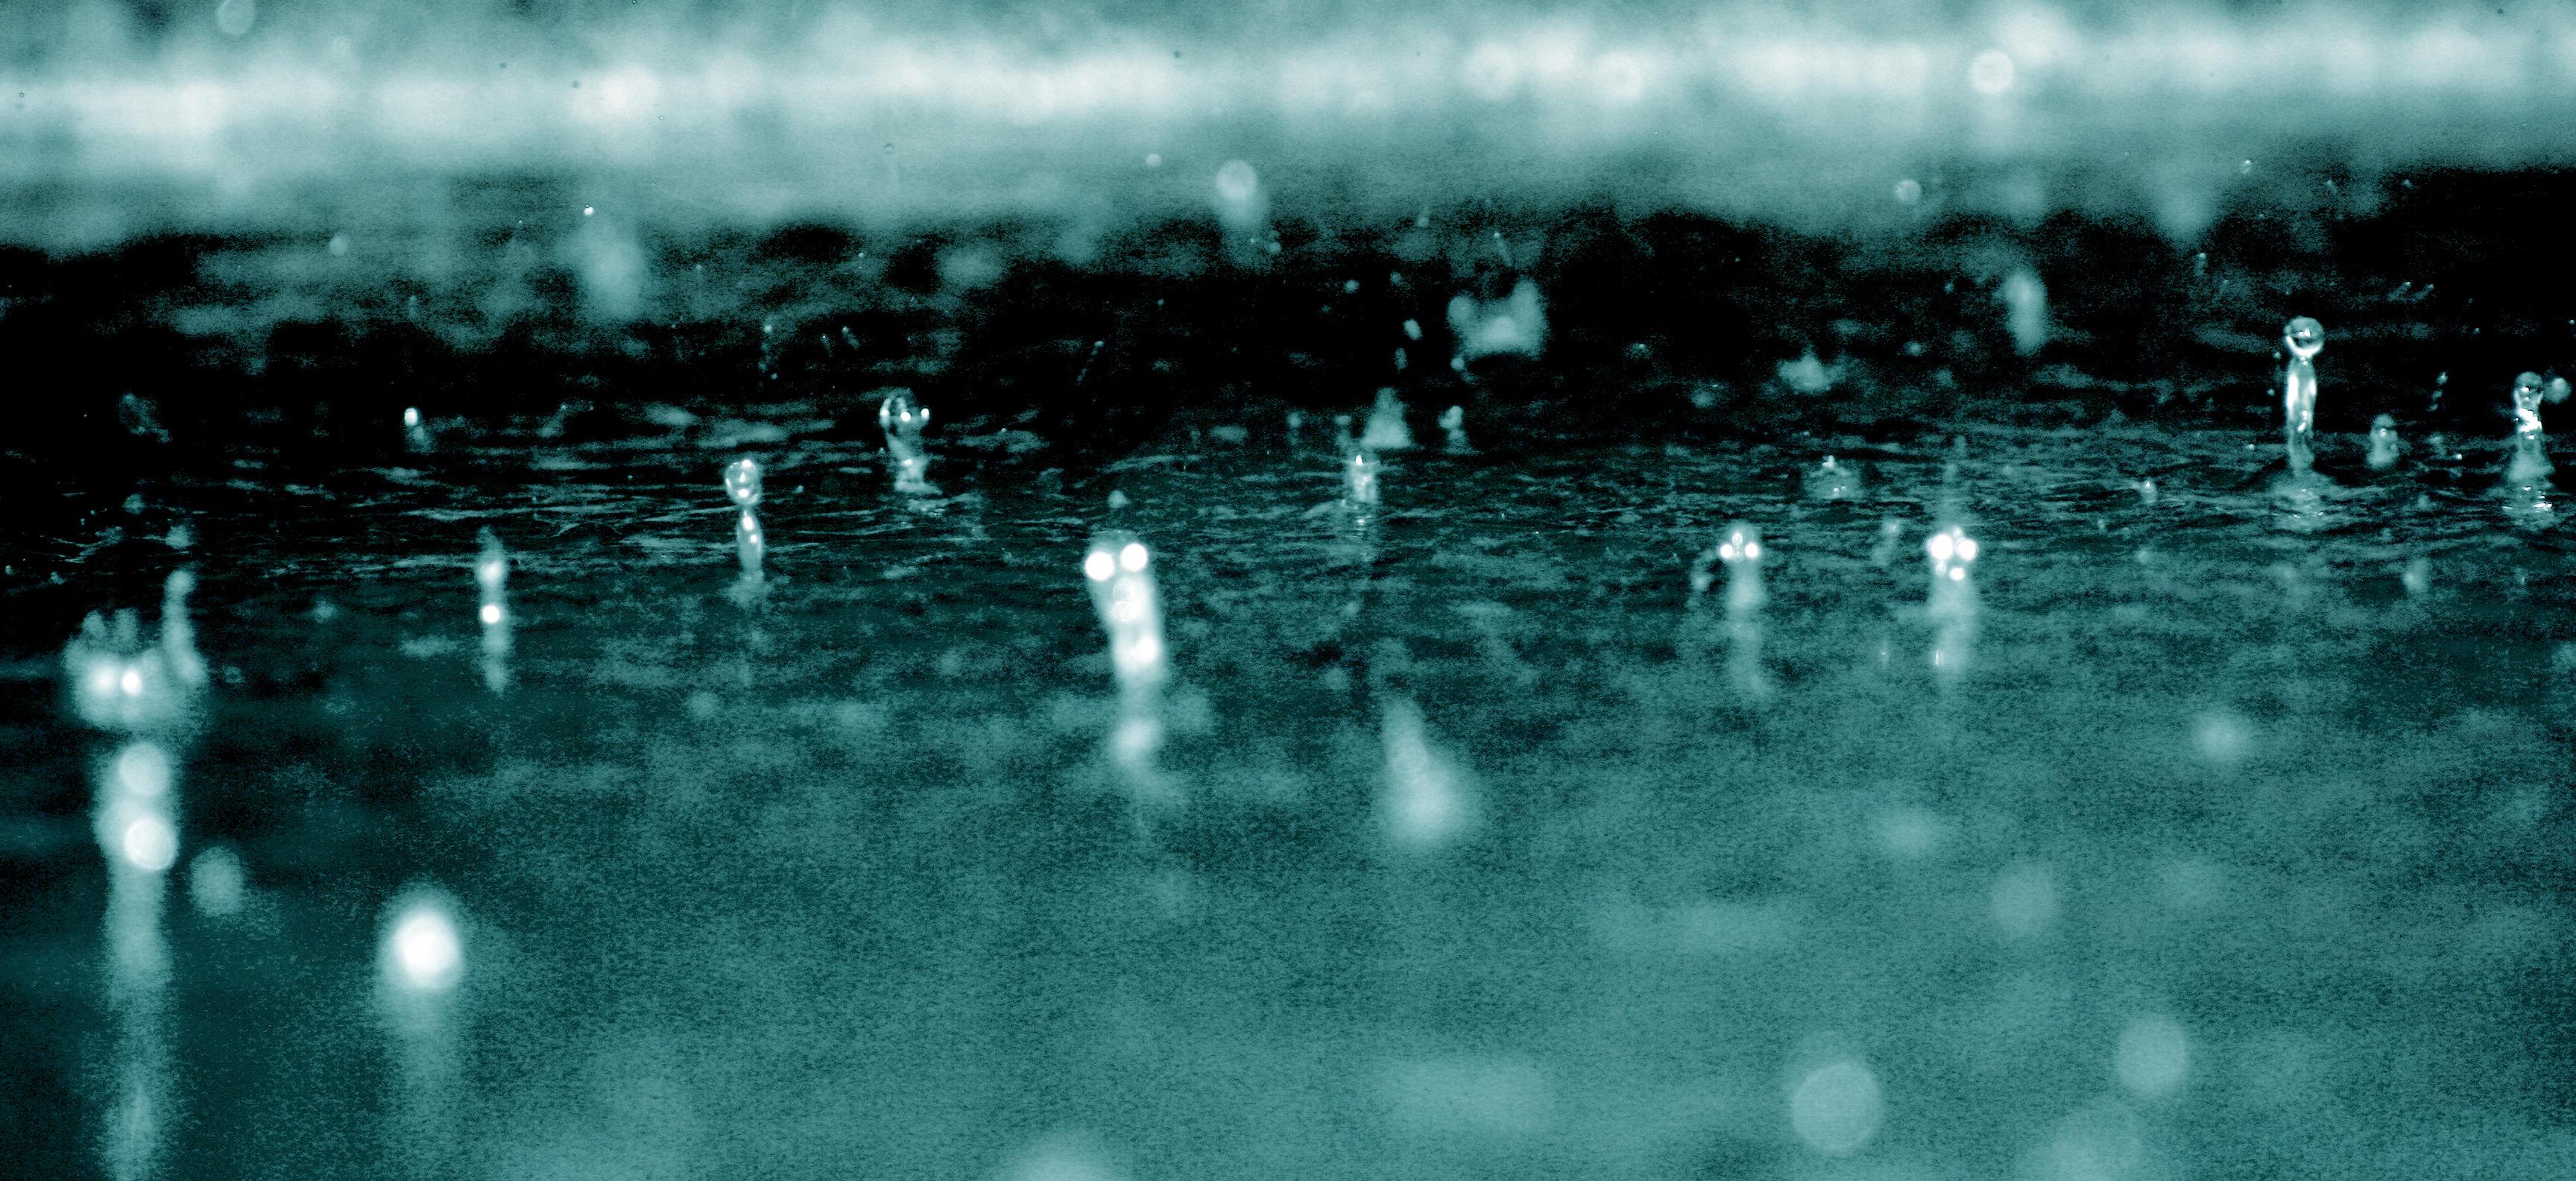 Tumblr gif backgrounds rain